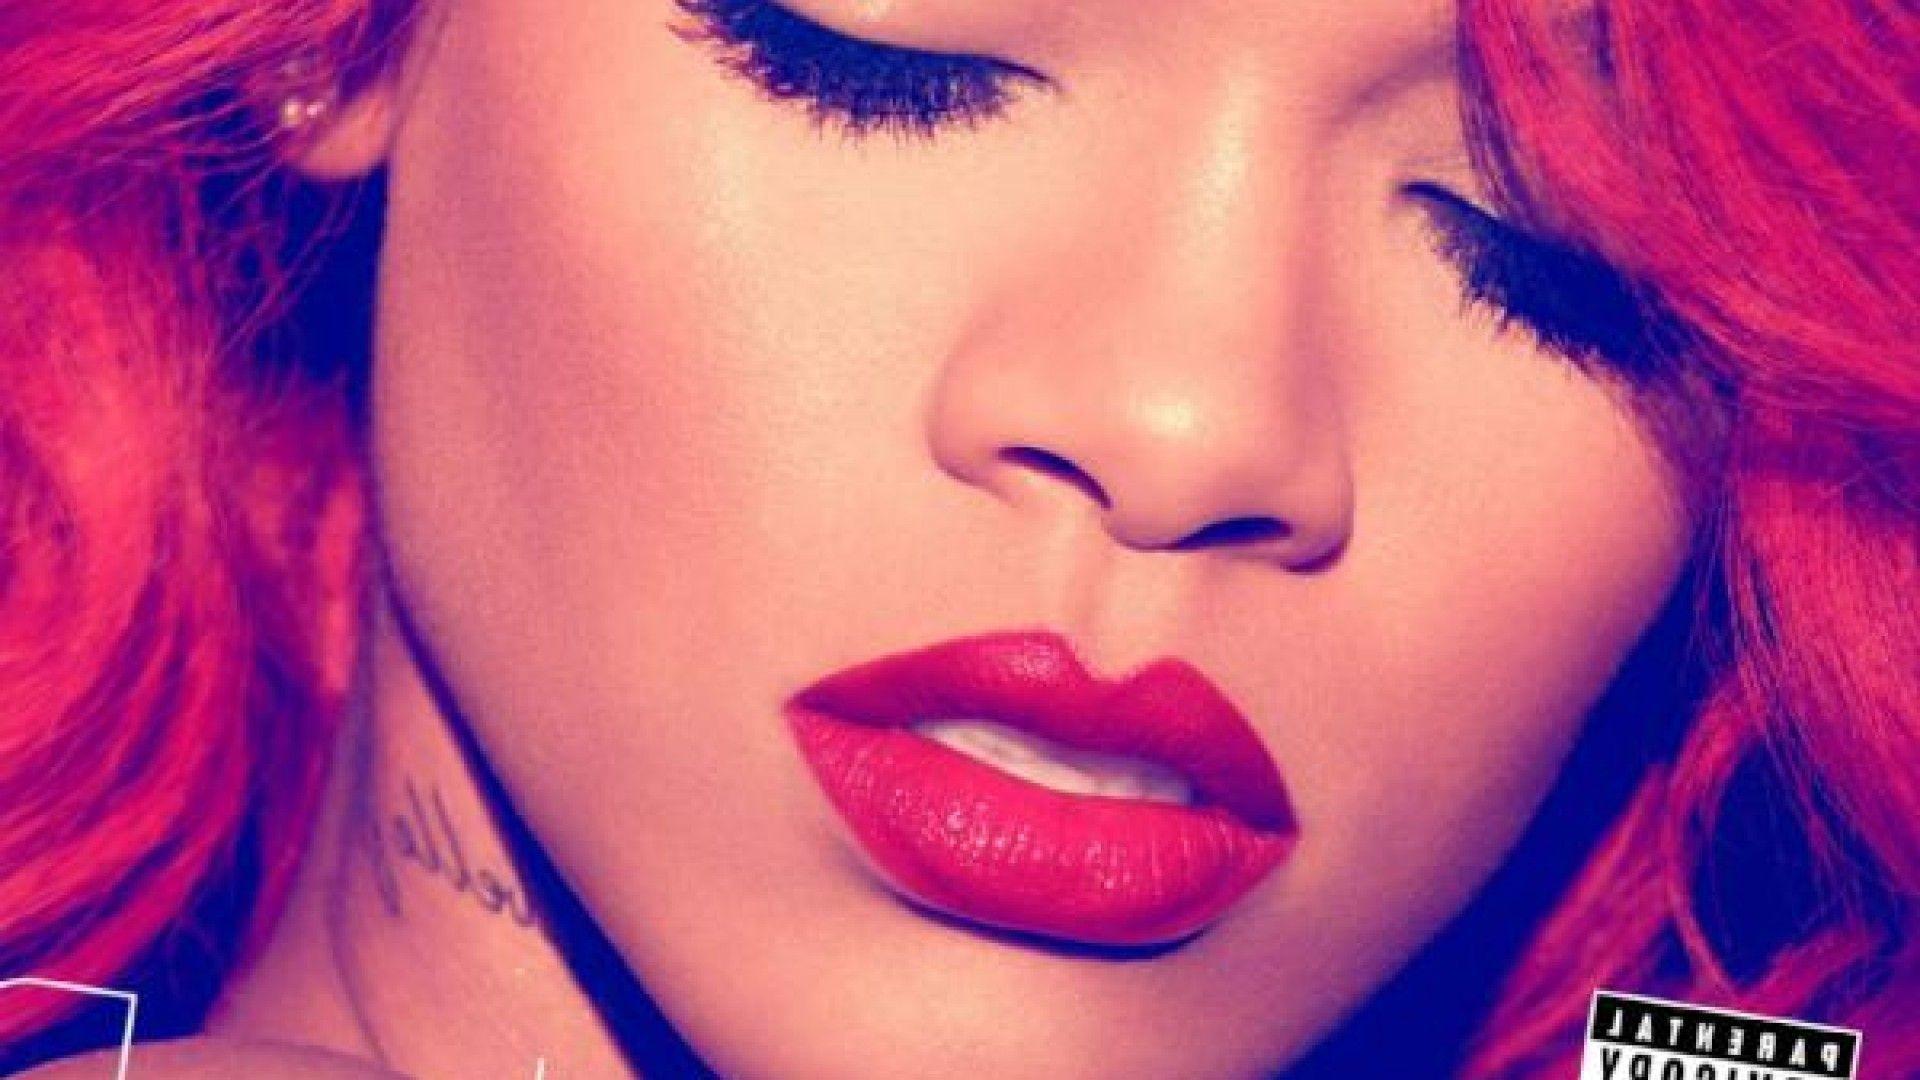 Rihanna wallpaper download free awesome hd wallpapers of 1920x1080 free rihanna wallpaper red hair 600x404px wallpaper rihanna real voltagebd Gallery